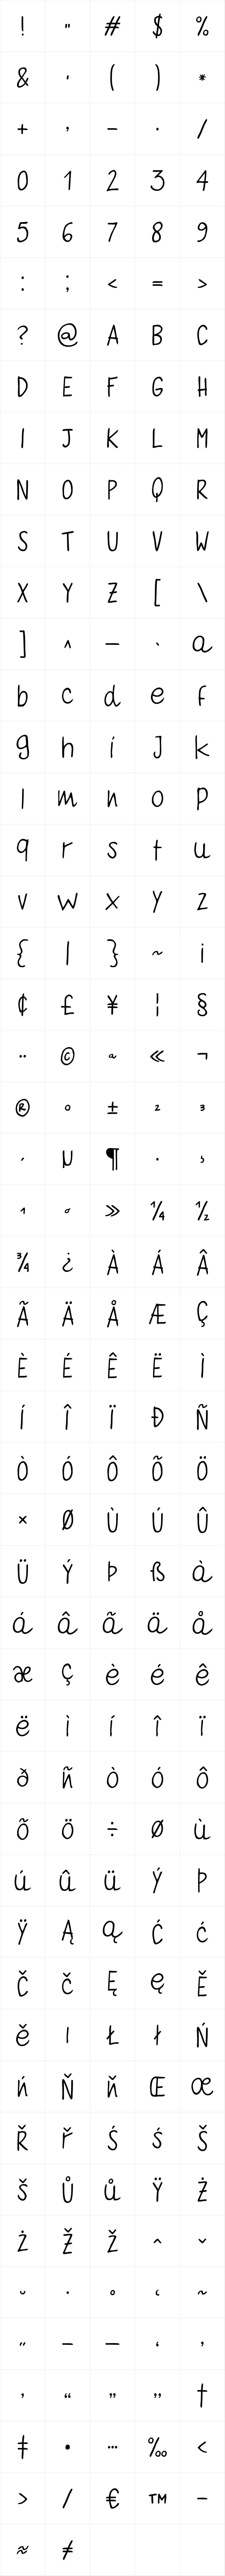 Quaderno Bianco